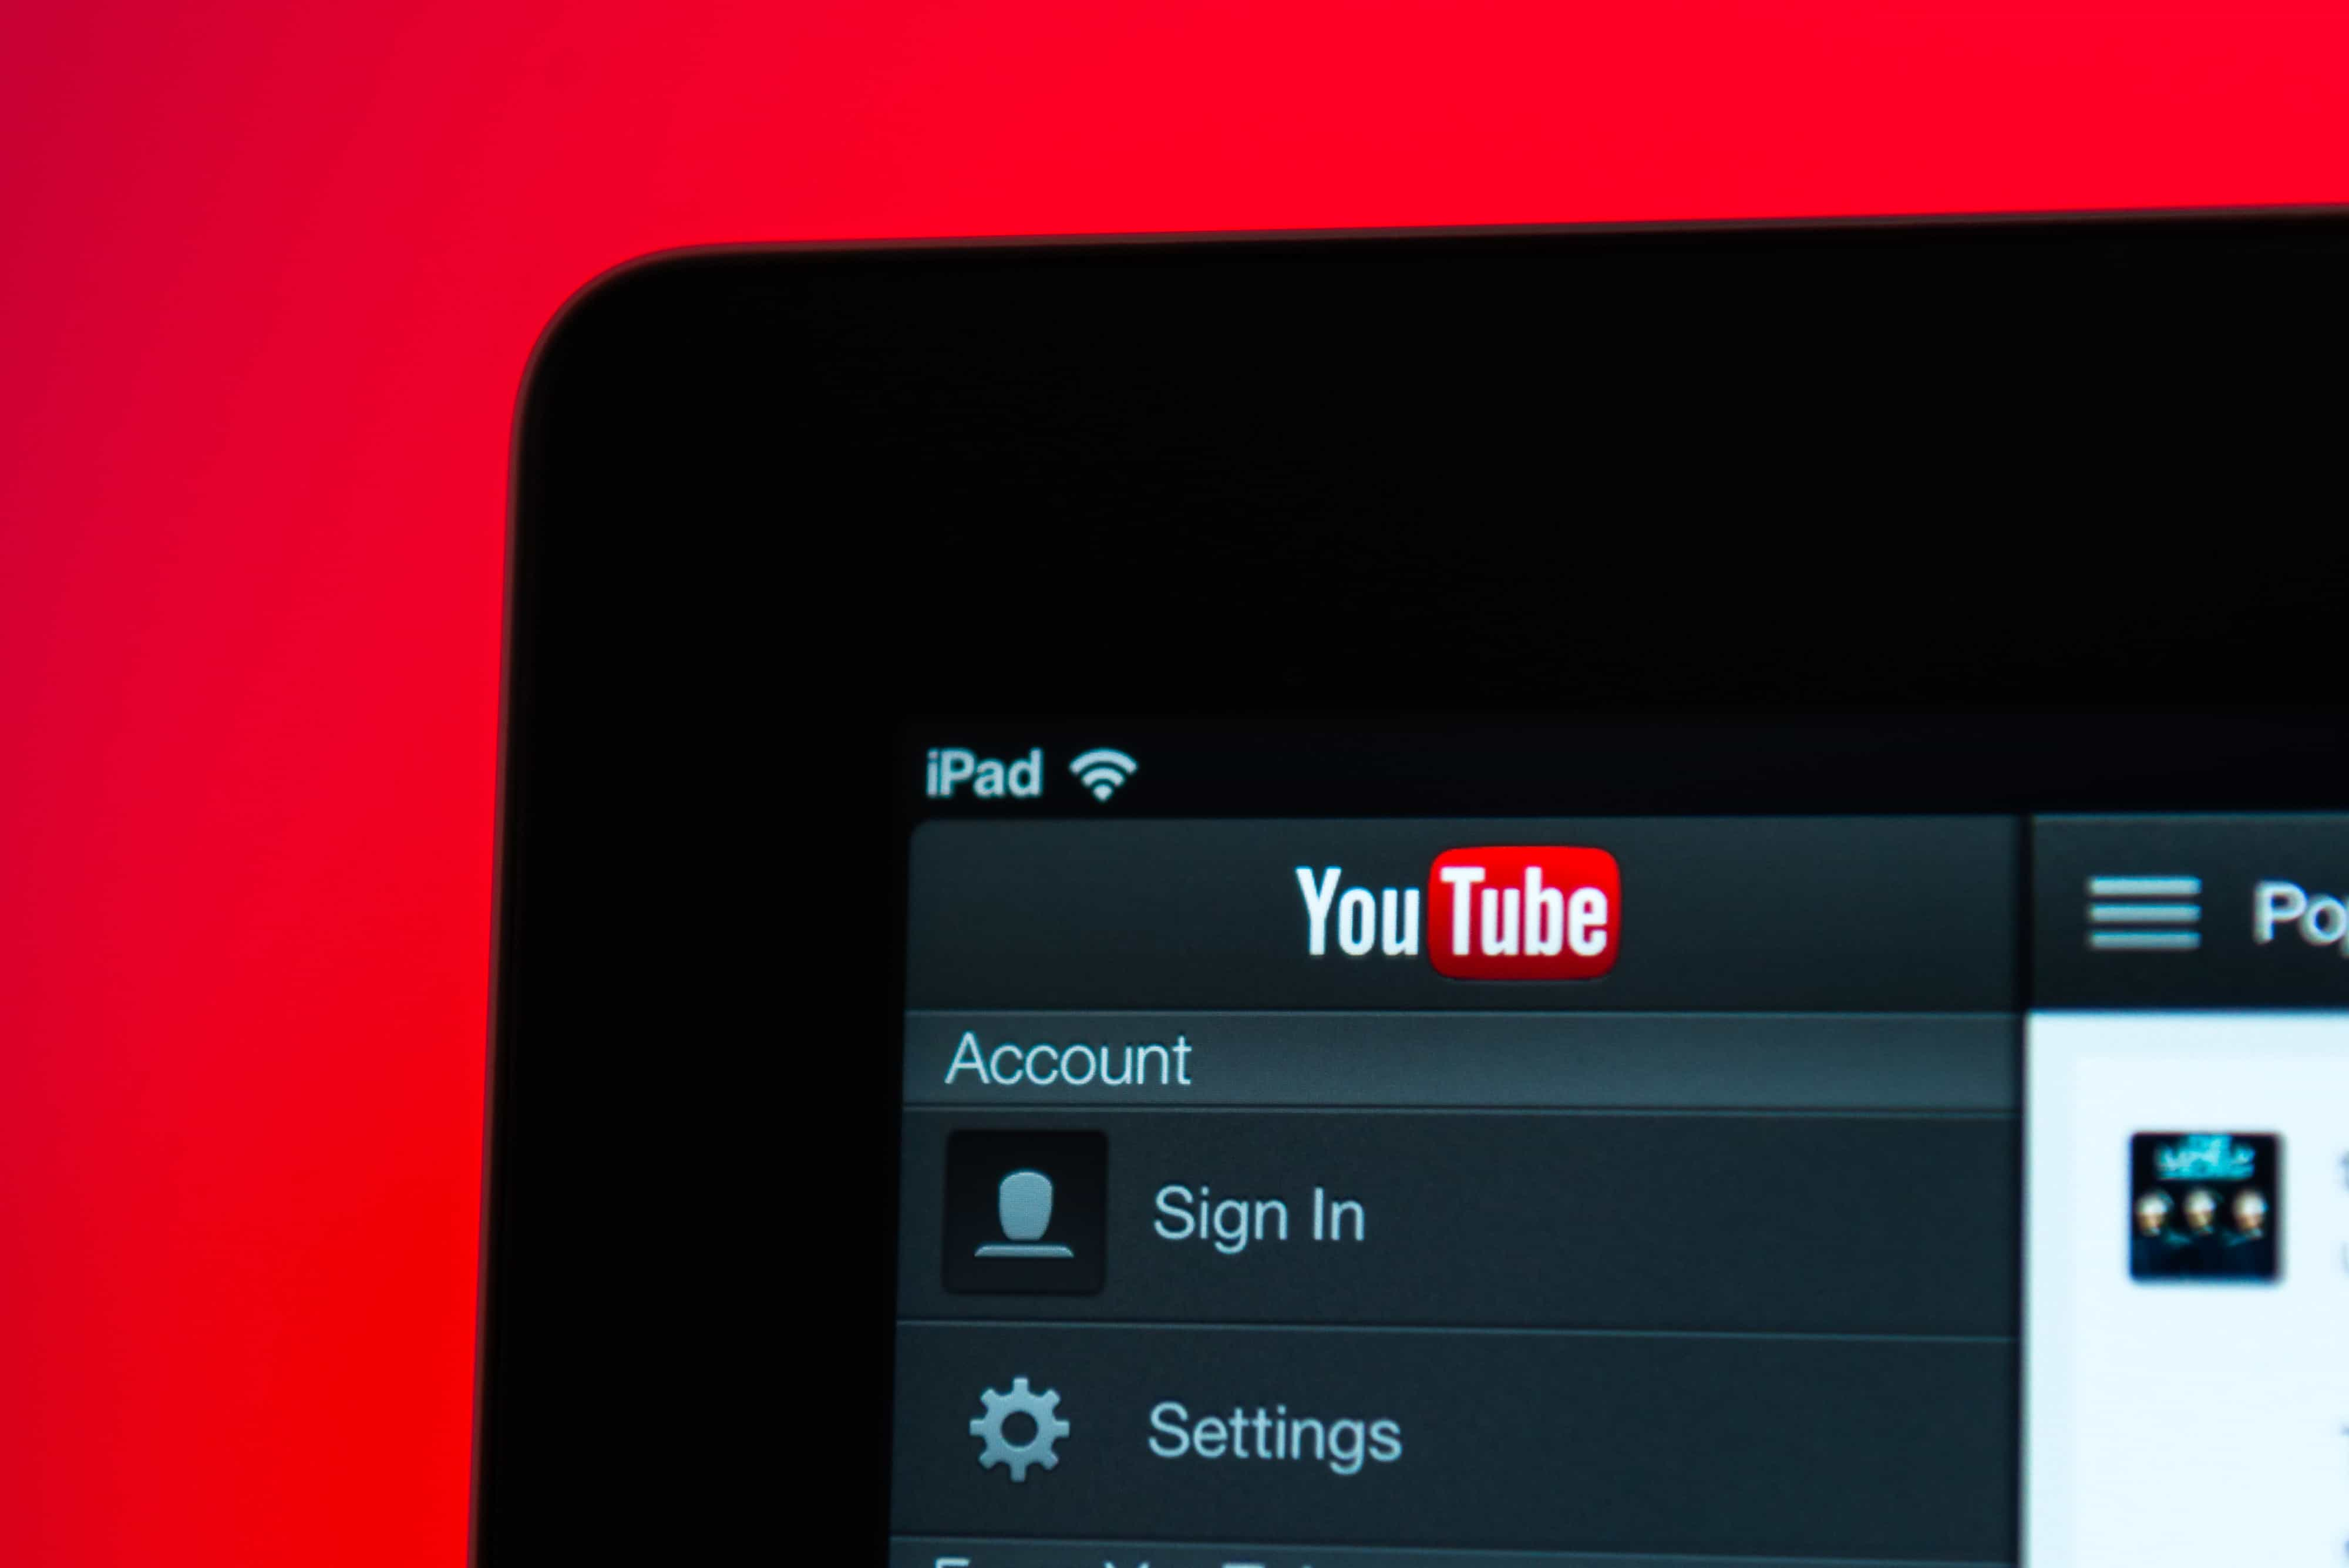 Fatos surpreendentes sobre o YouTube que vão lhe deixar de queixo caído